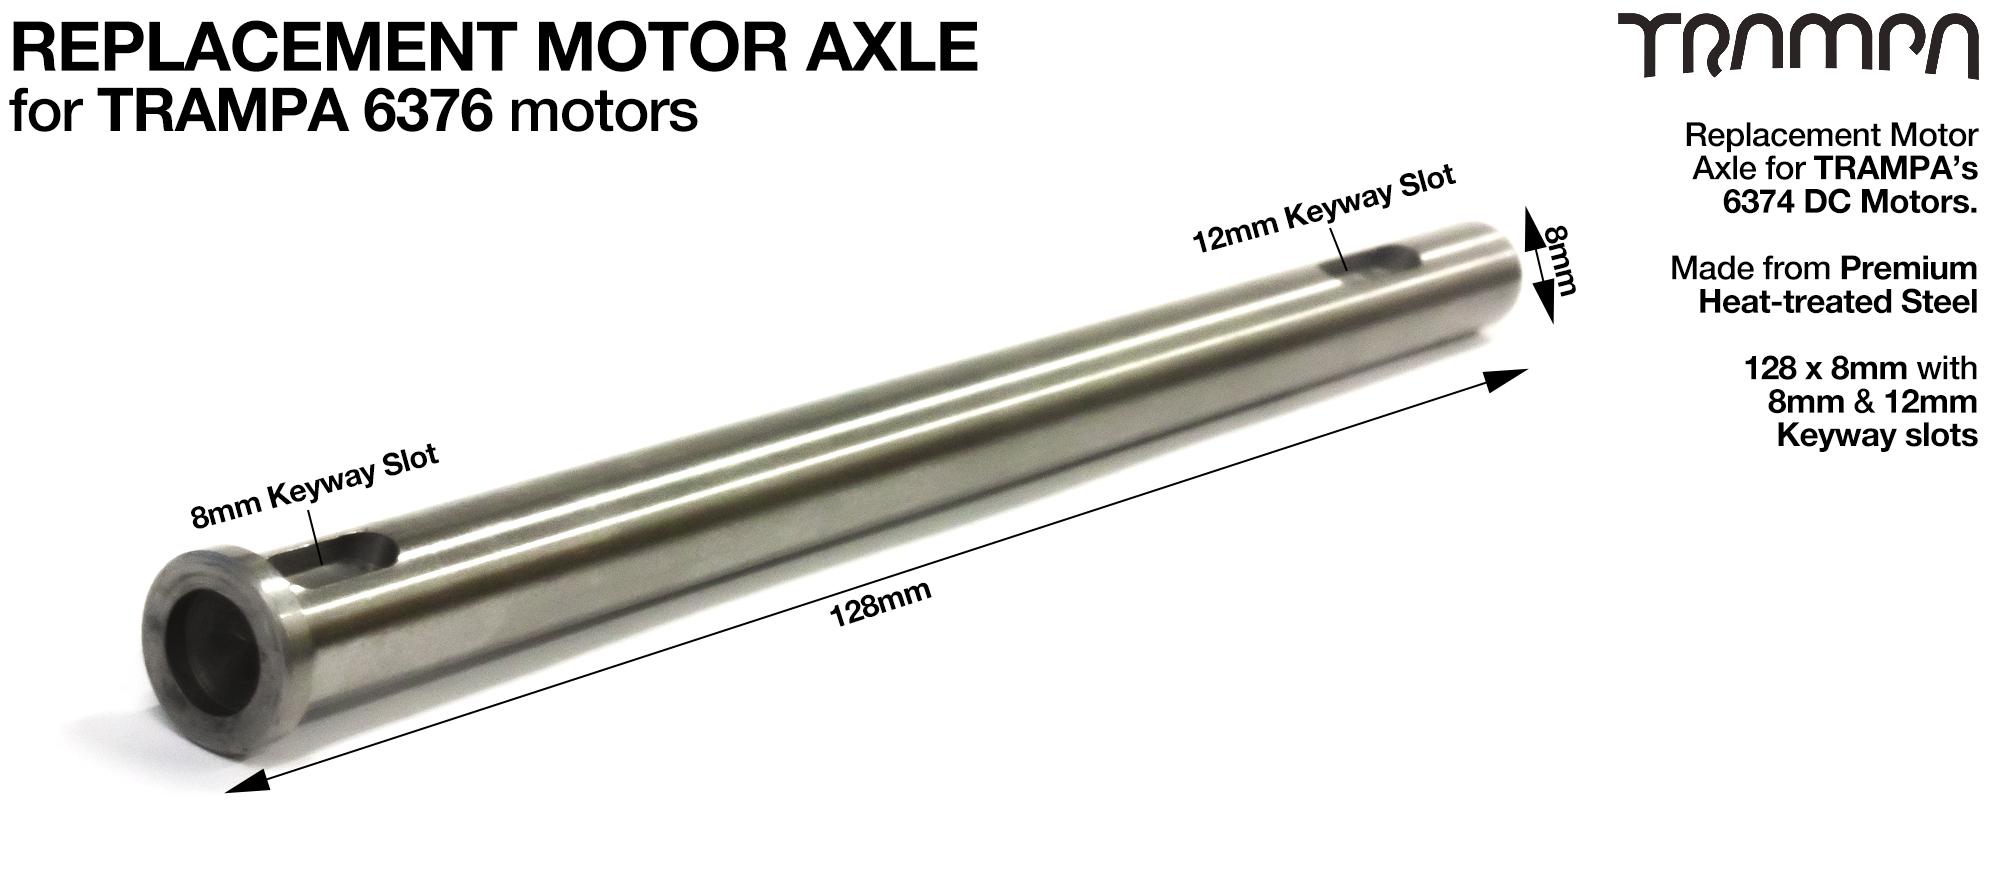 Stainless Steel Motor Axle 128 x 8mm - for TRAMPA's 6376 DC Motors